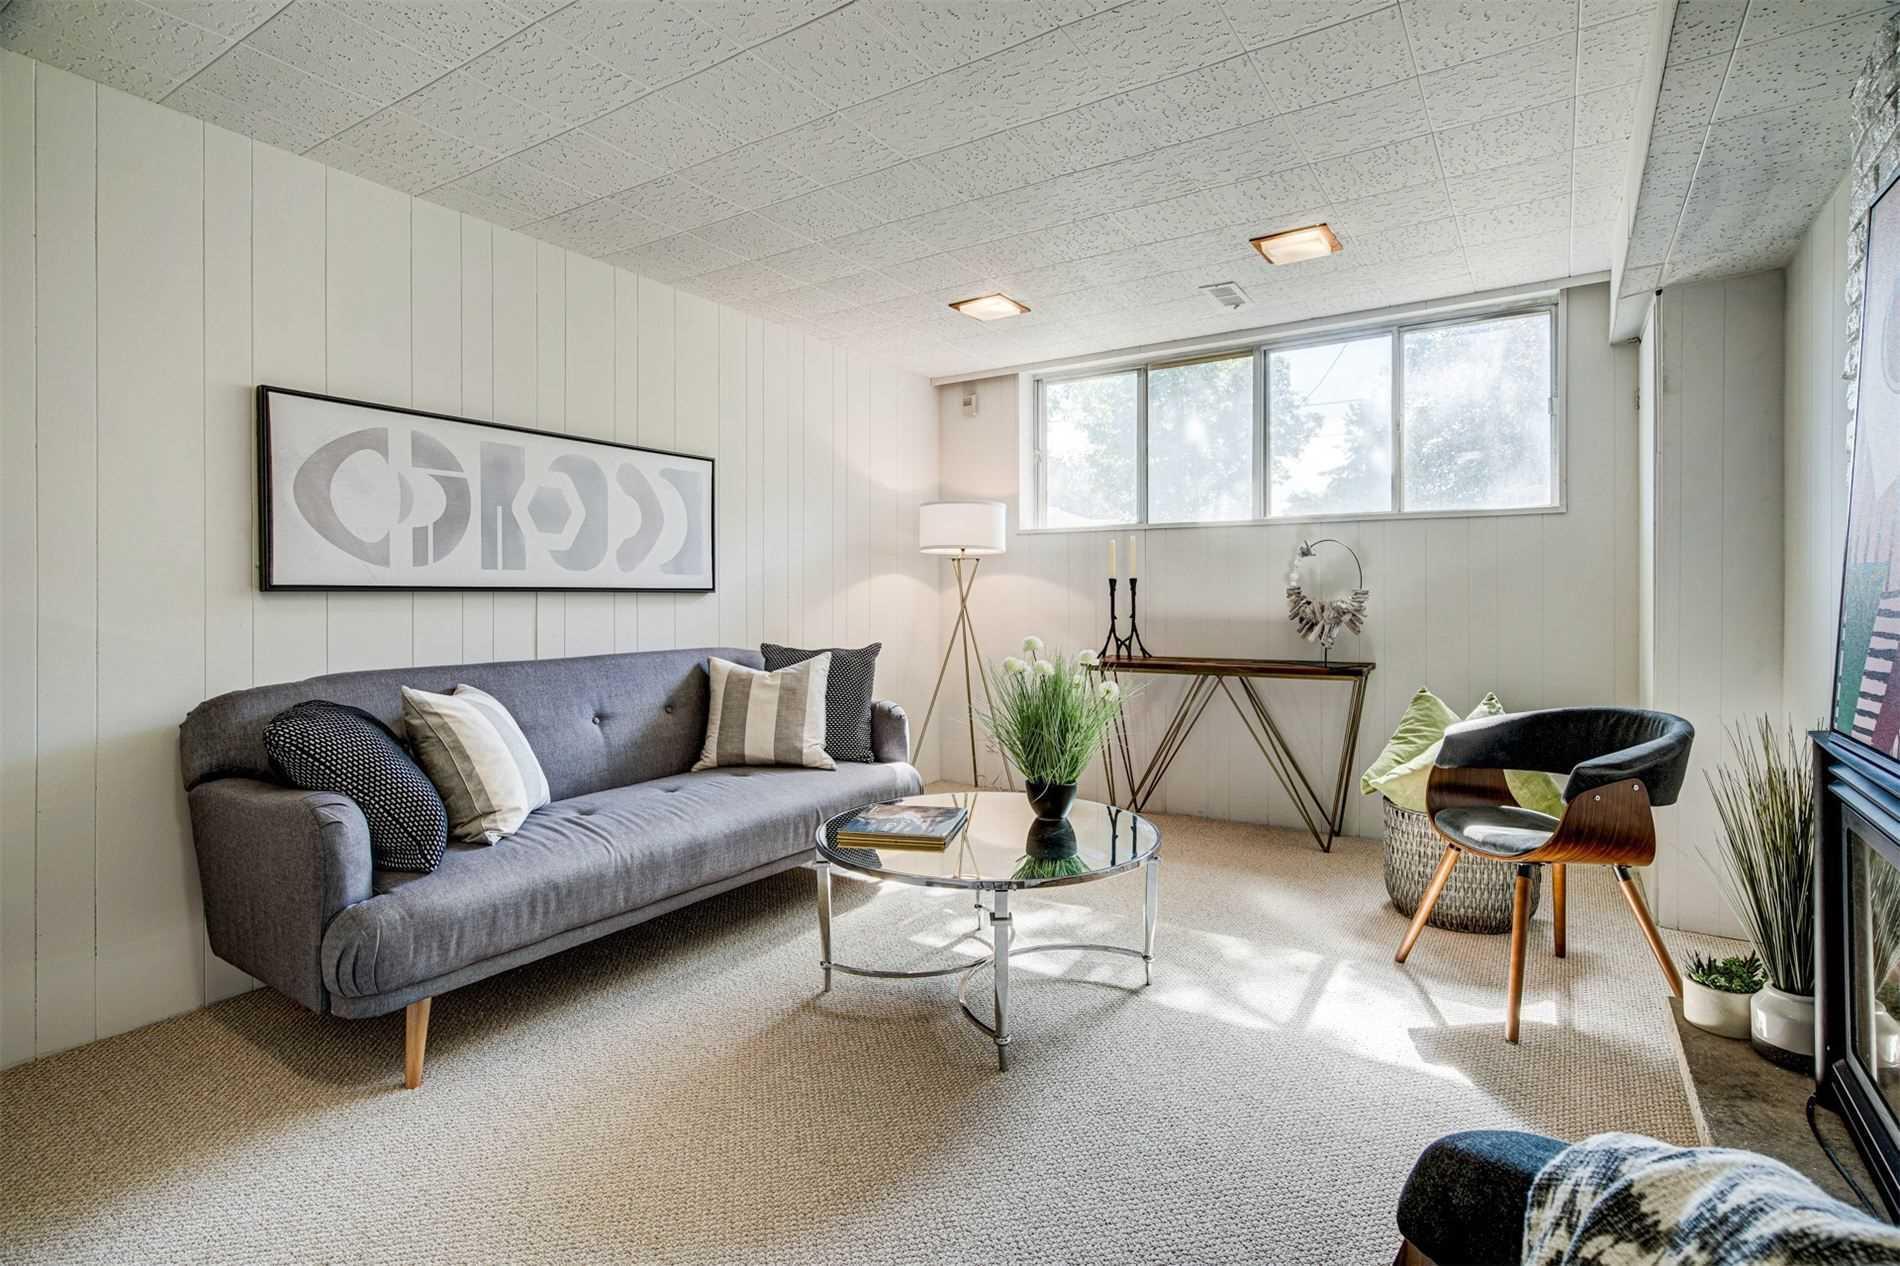 140 Verobeach Blvd - Humbermede Detached for sale, 3 Bedrooms (W5385046) - #24